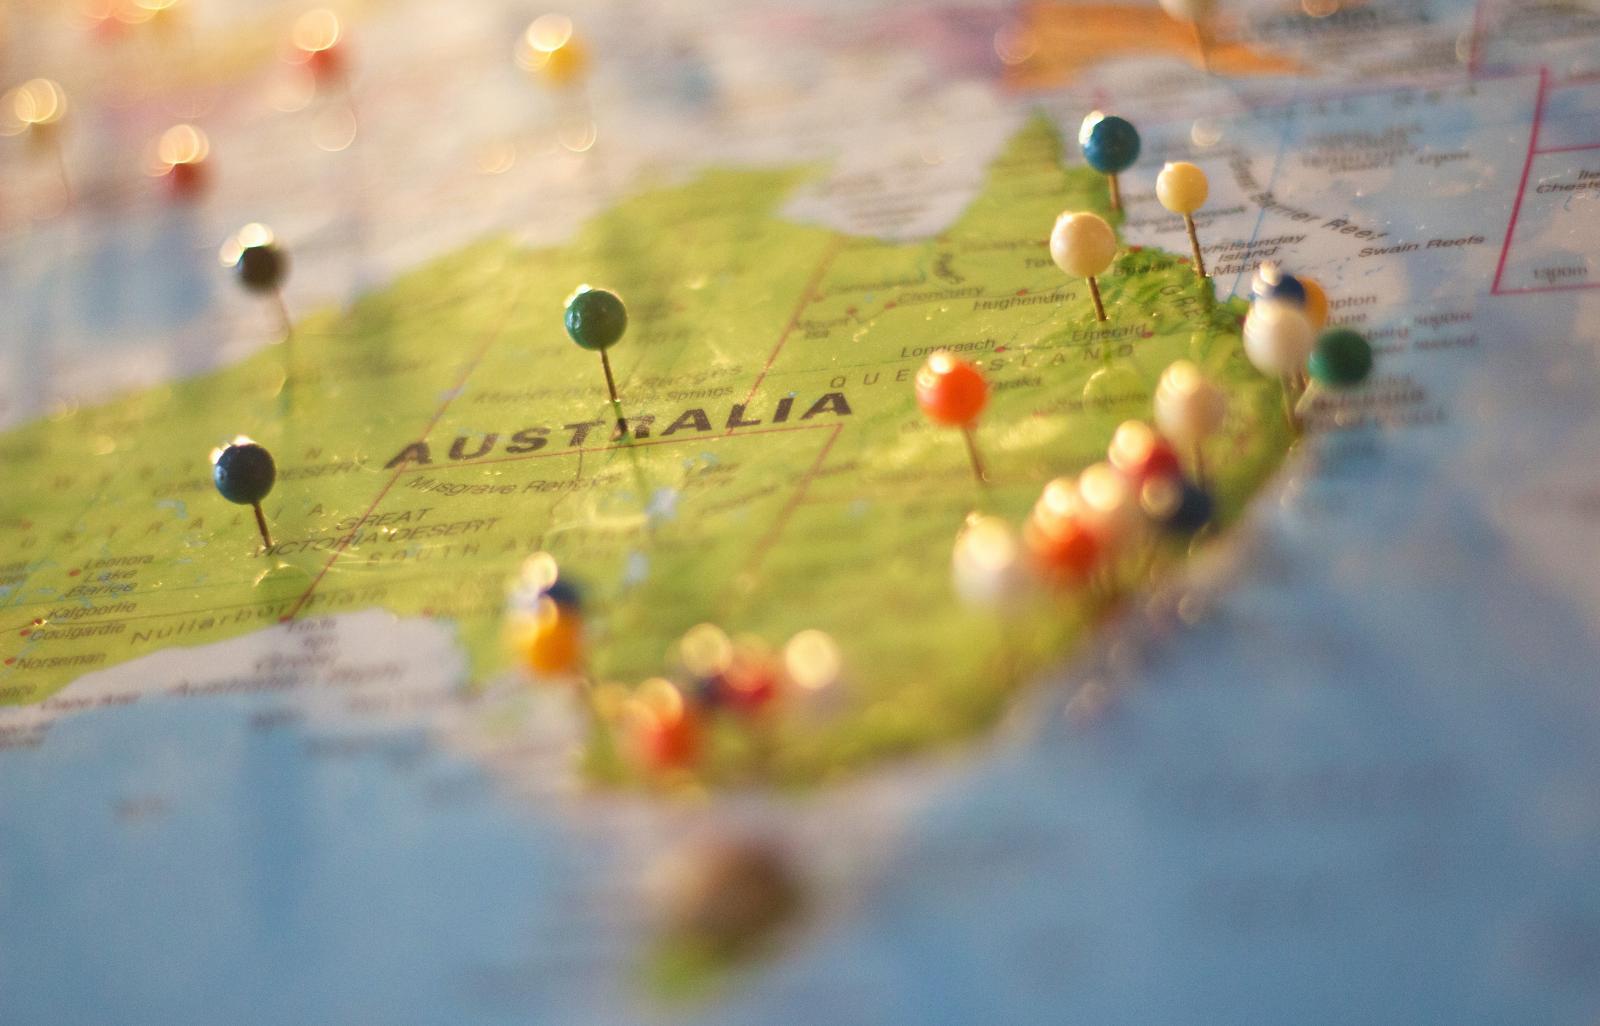 Australia. Photo credit: Pexels